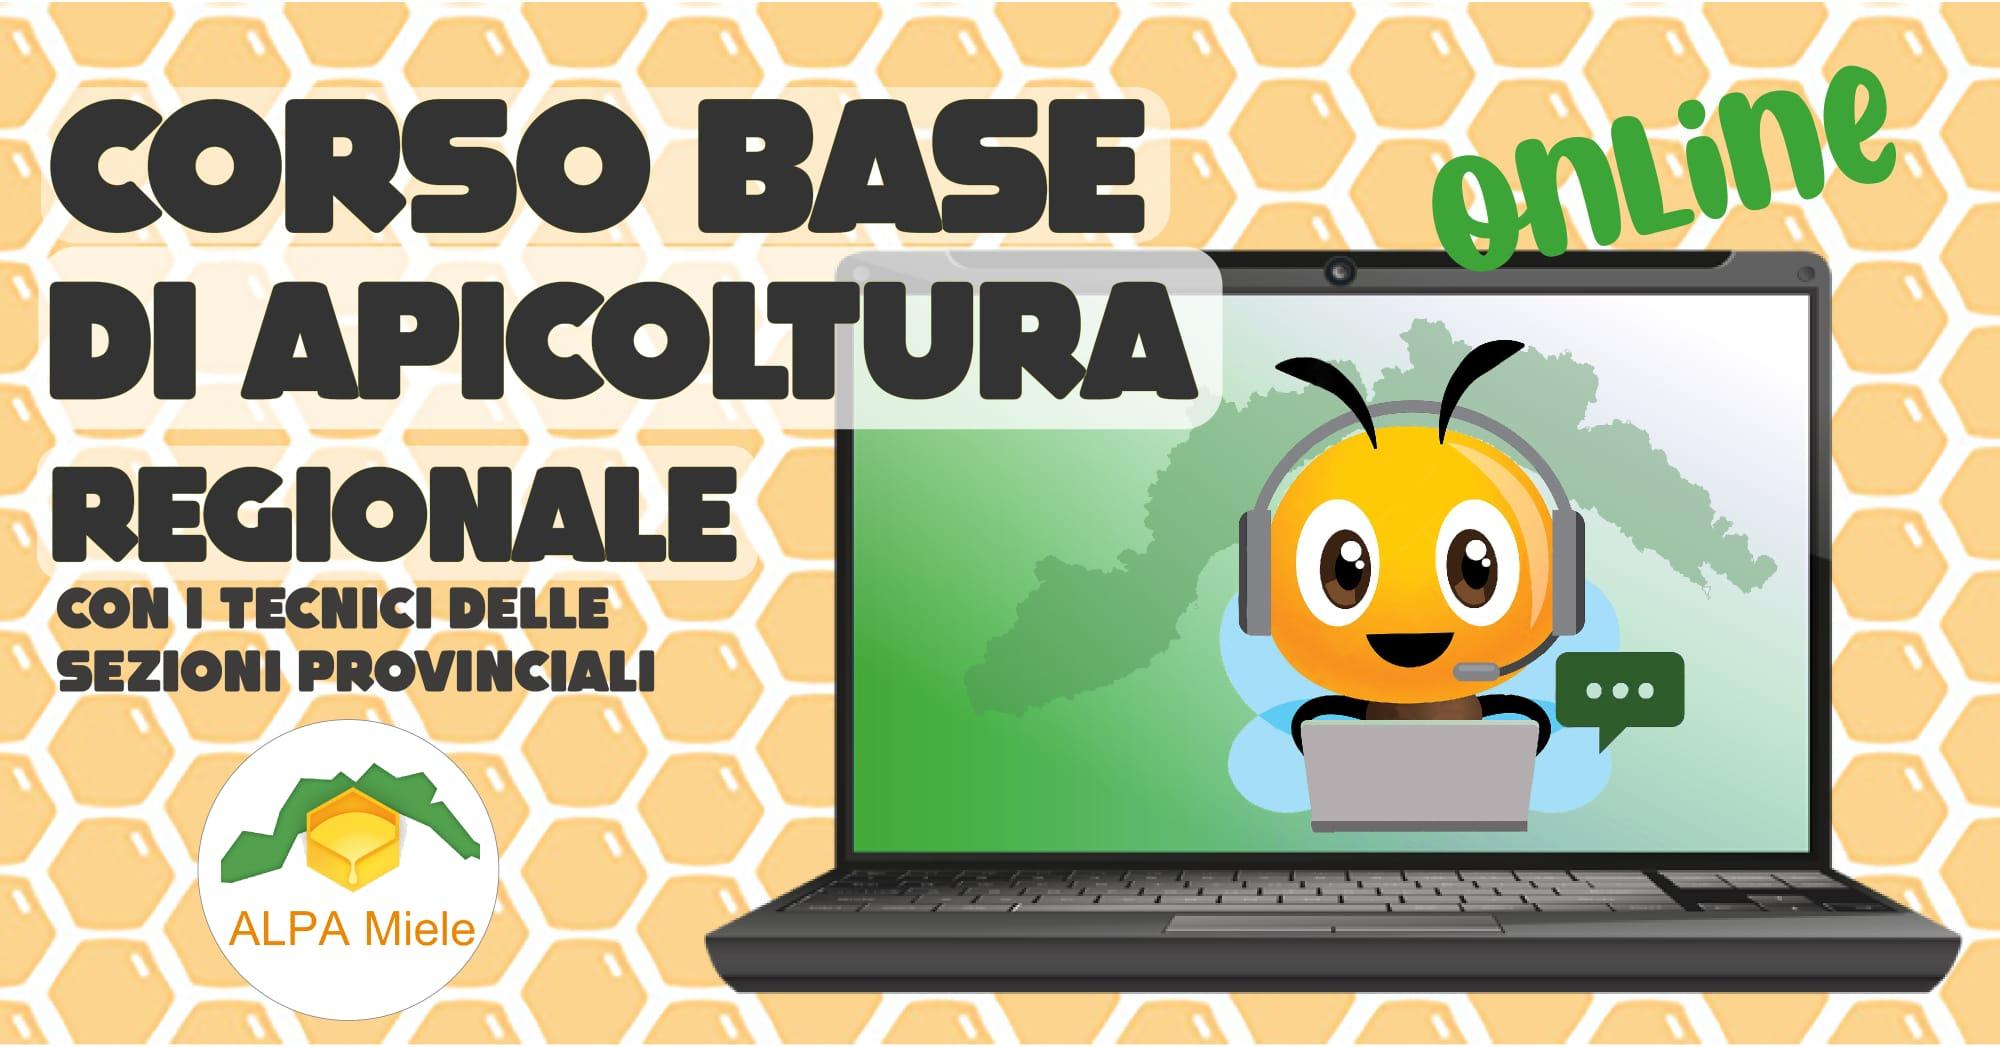 Corso Base Regionale Online